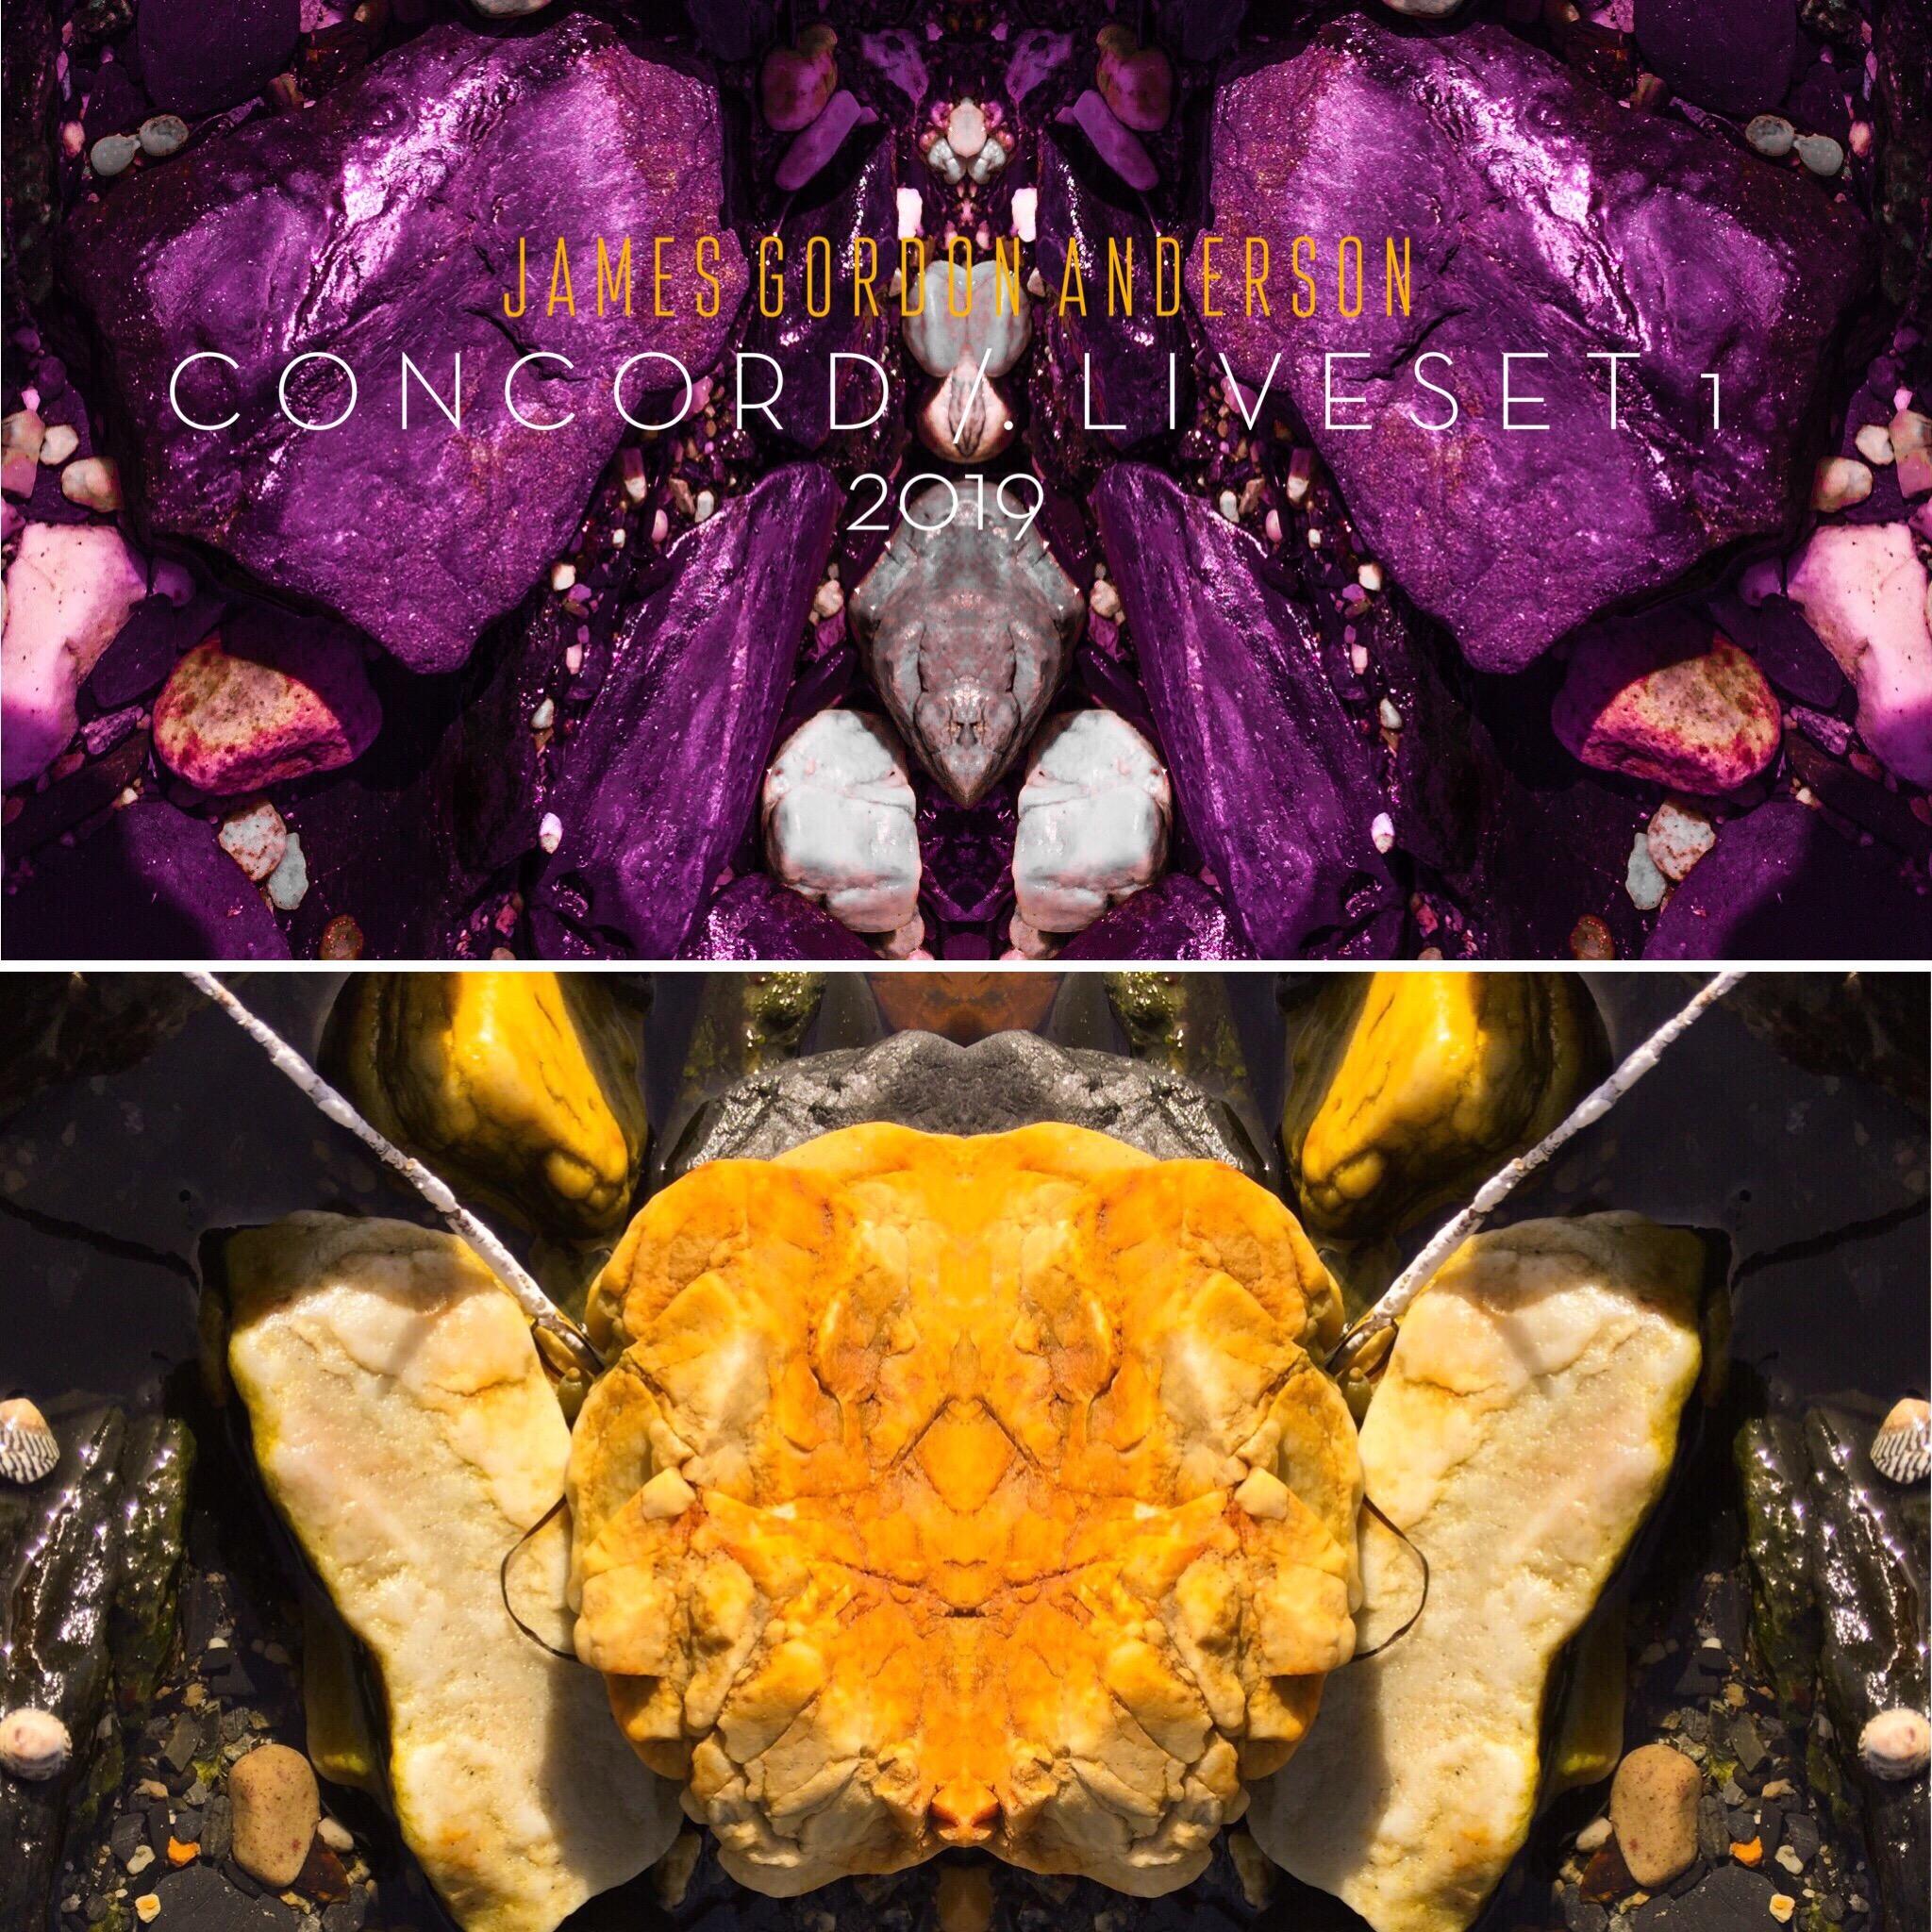 Concord - Liveset 1 (2019) - HD Video with Album Art